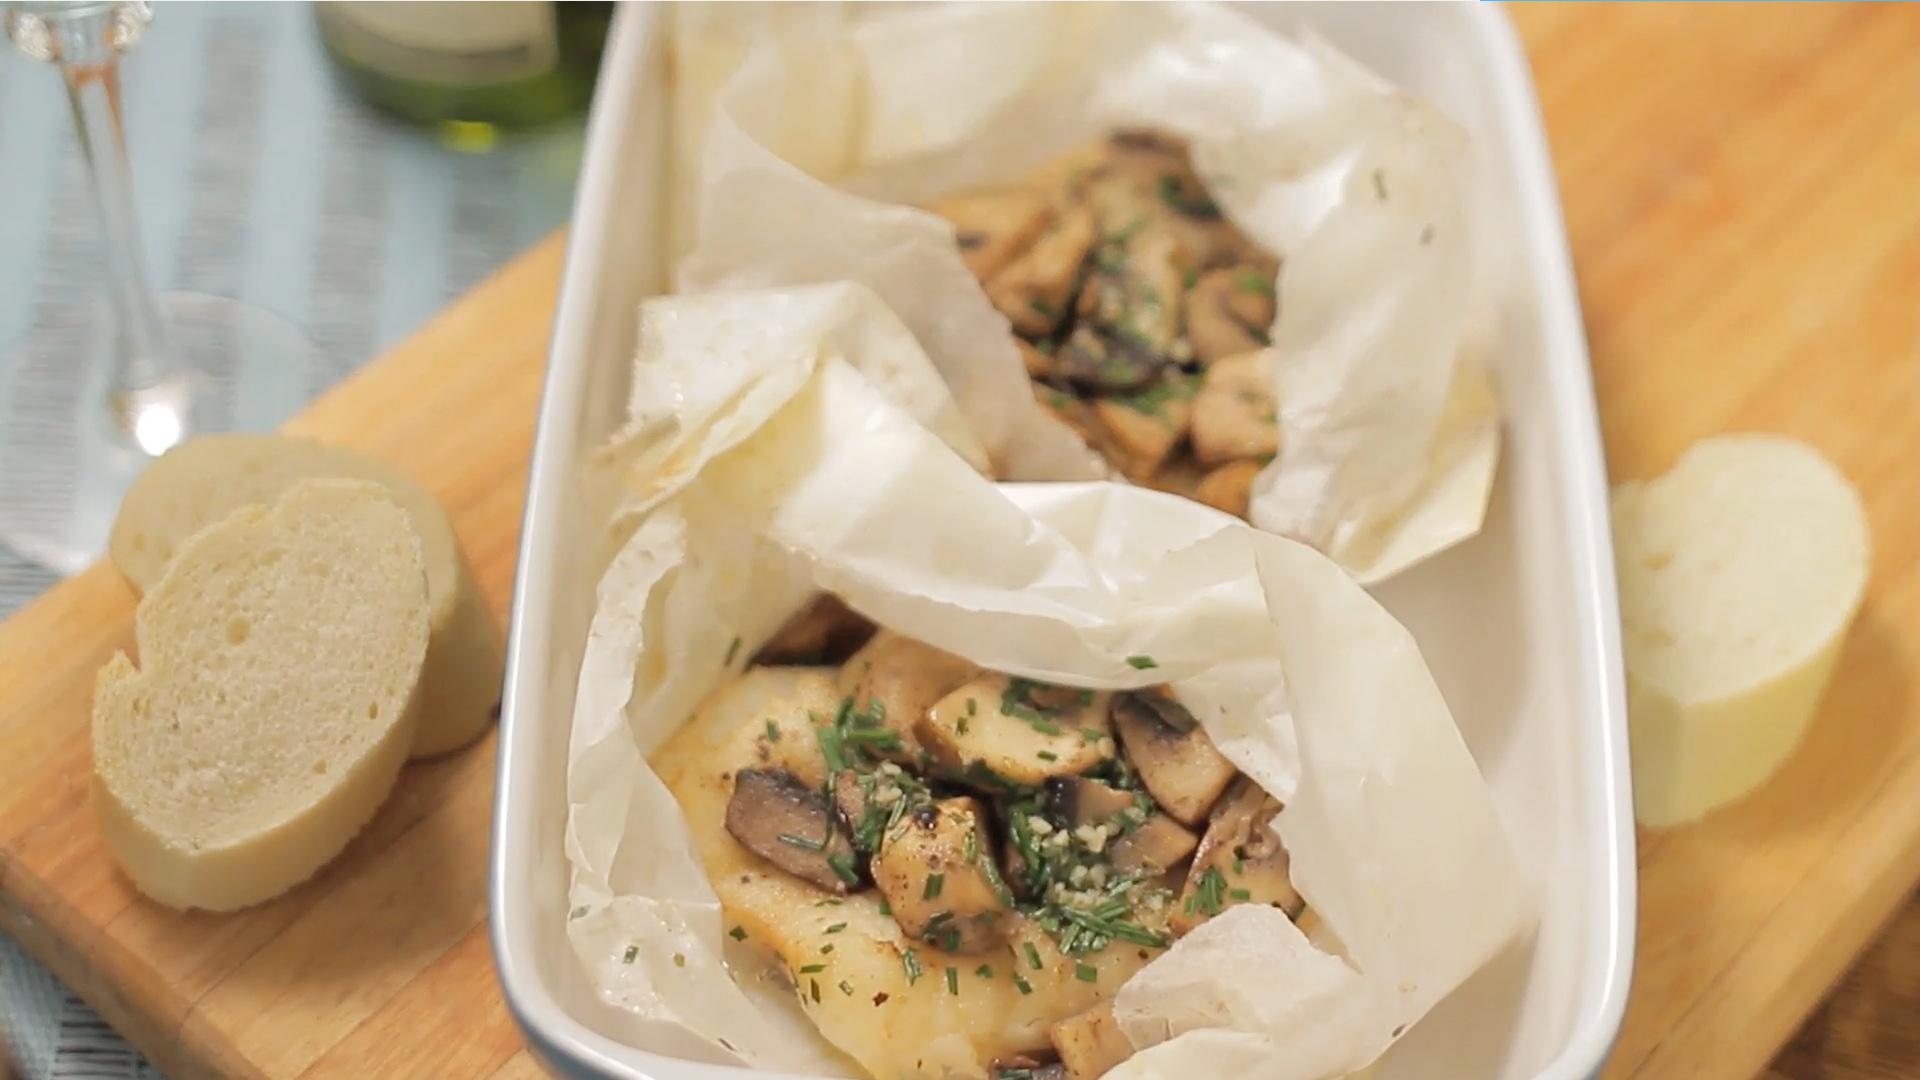 Hake & Mushrooms Baked in Paper